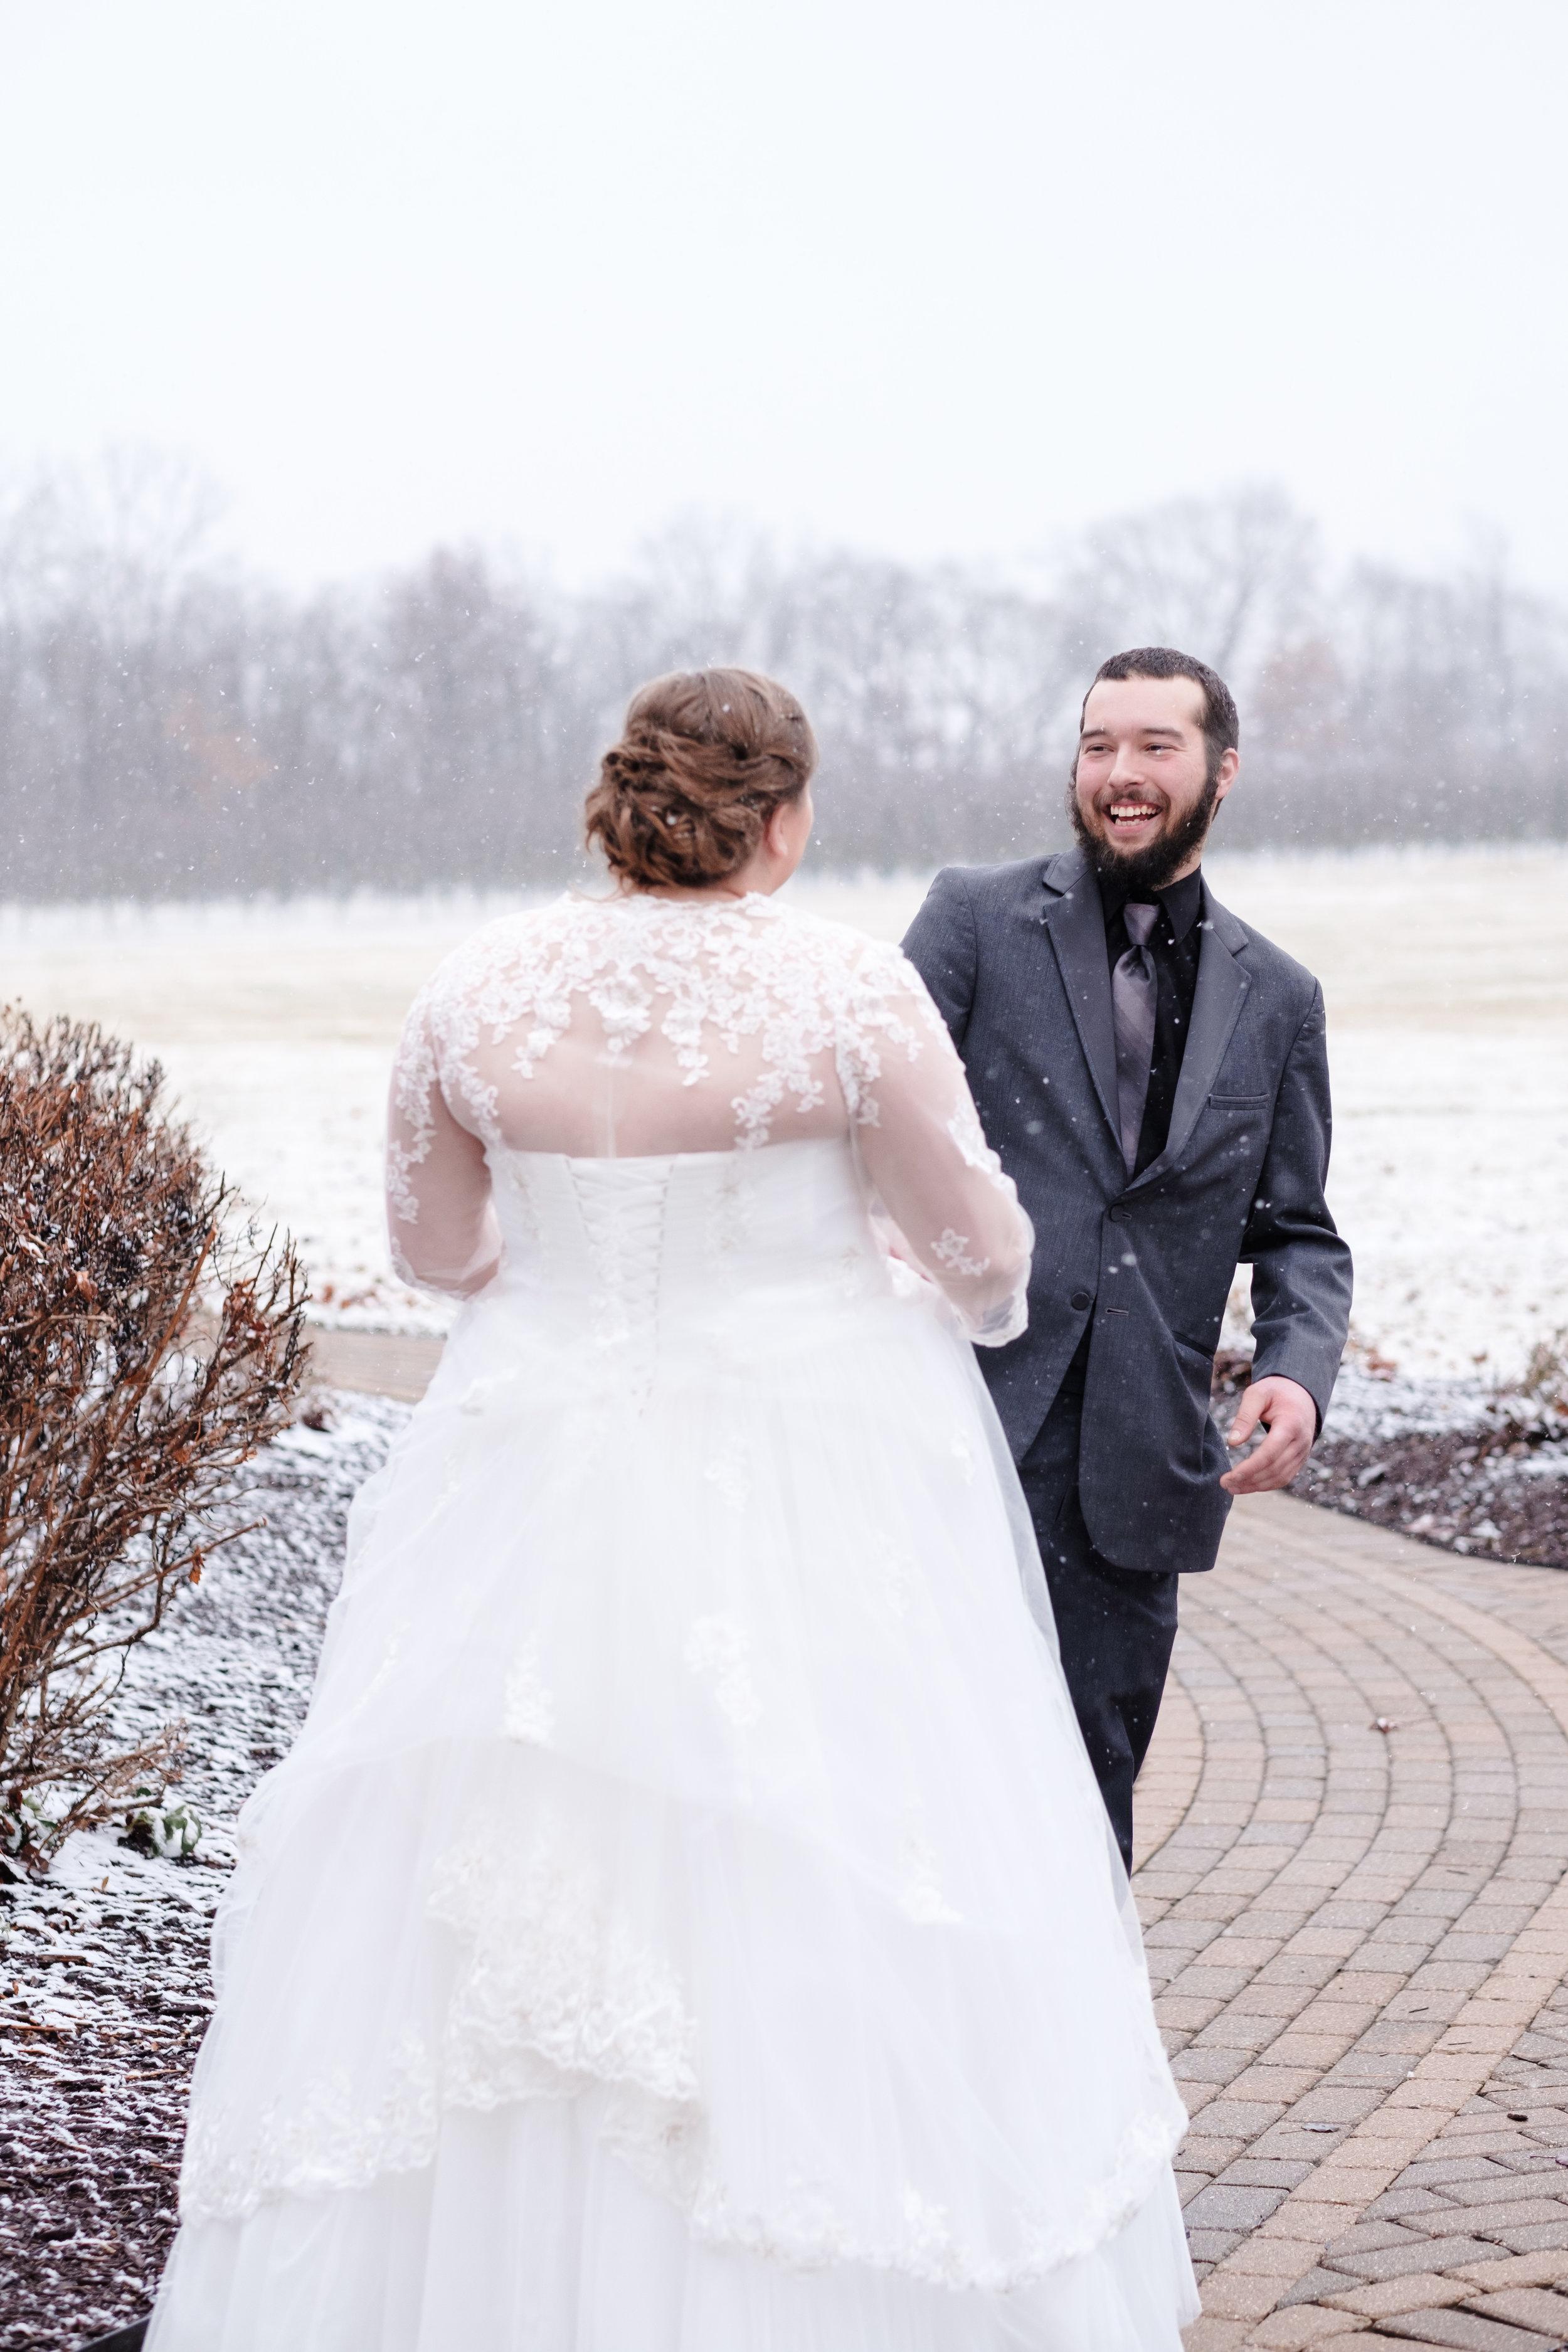 18-12-28 Corinne-Henry-Pavilion-Wedding-103.jpg